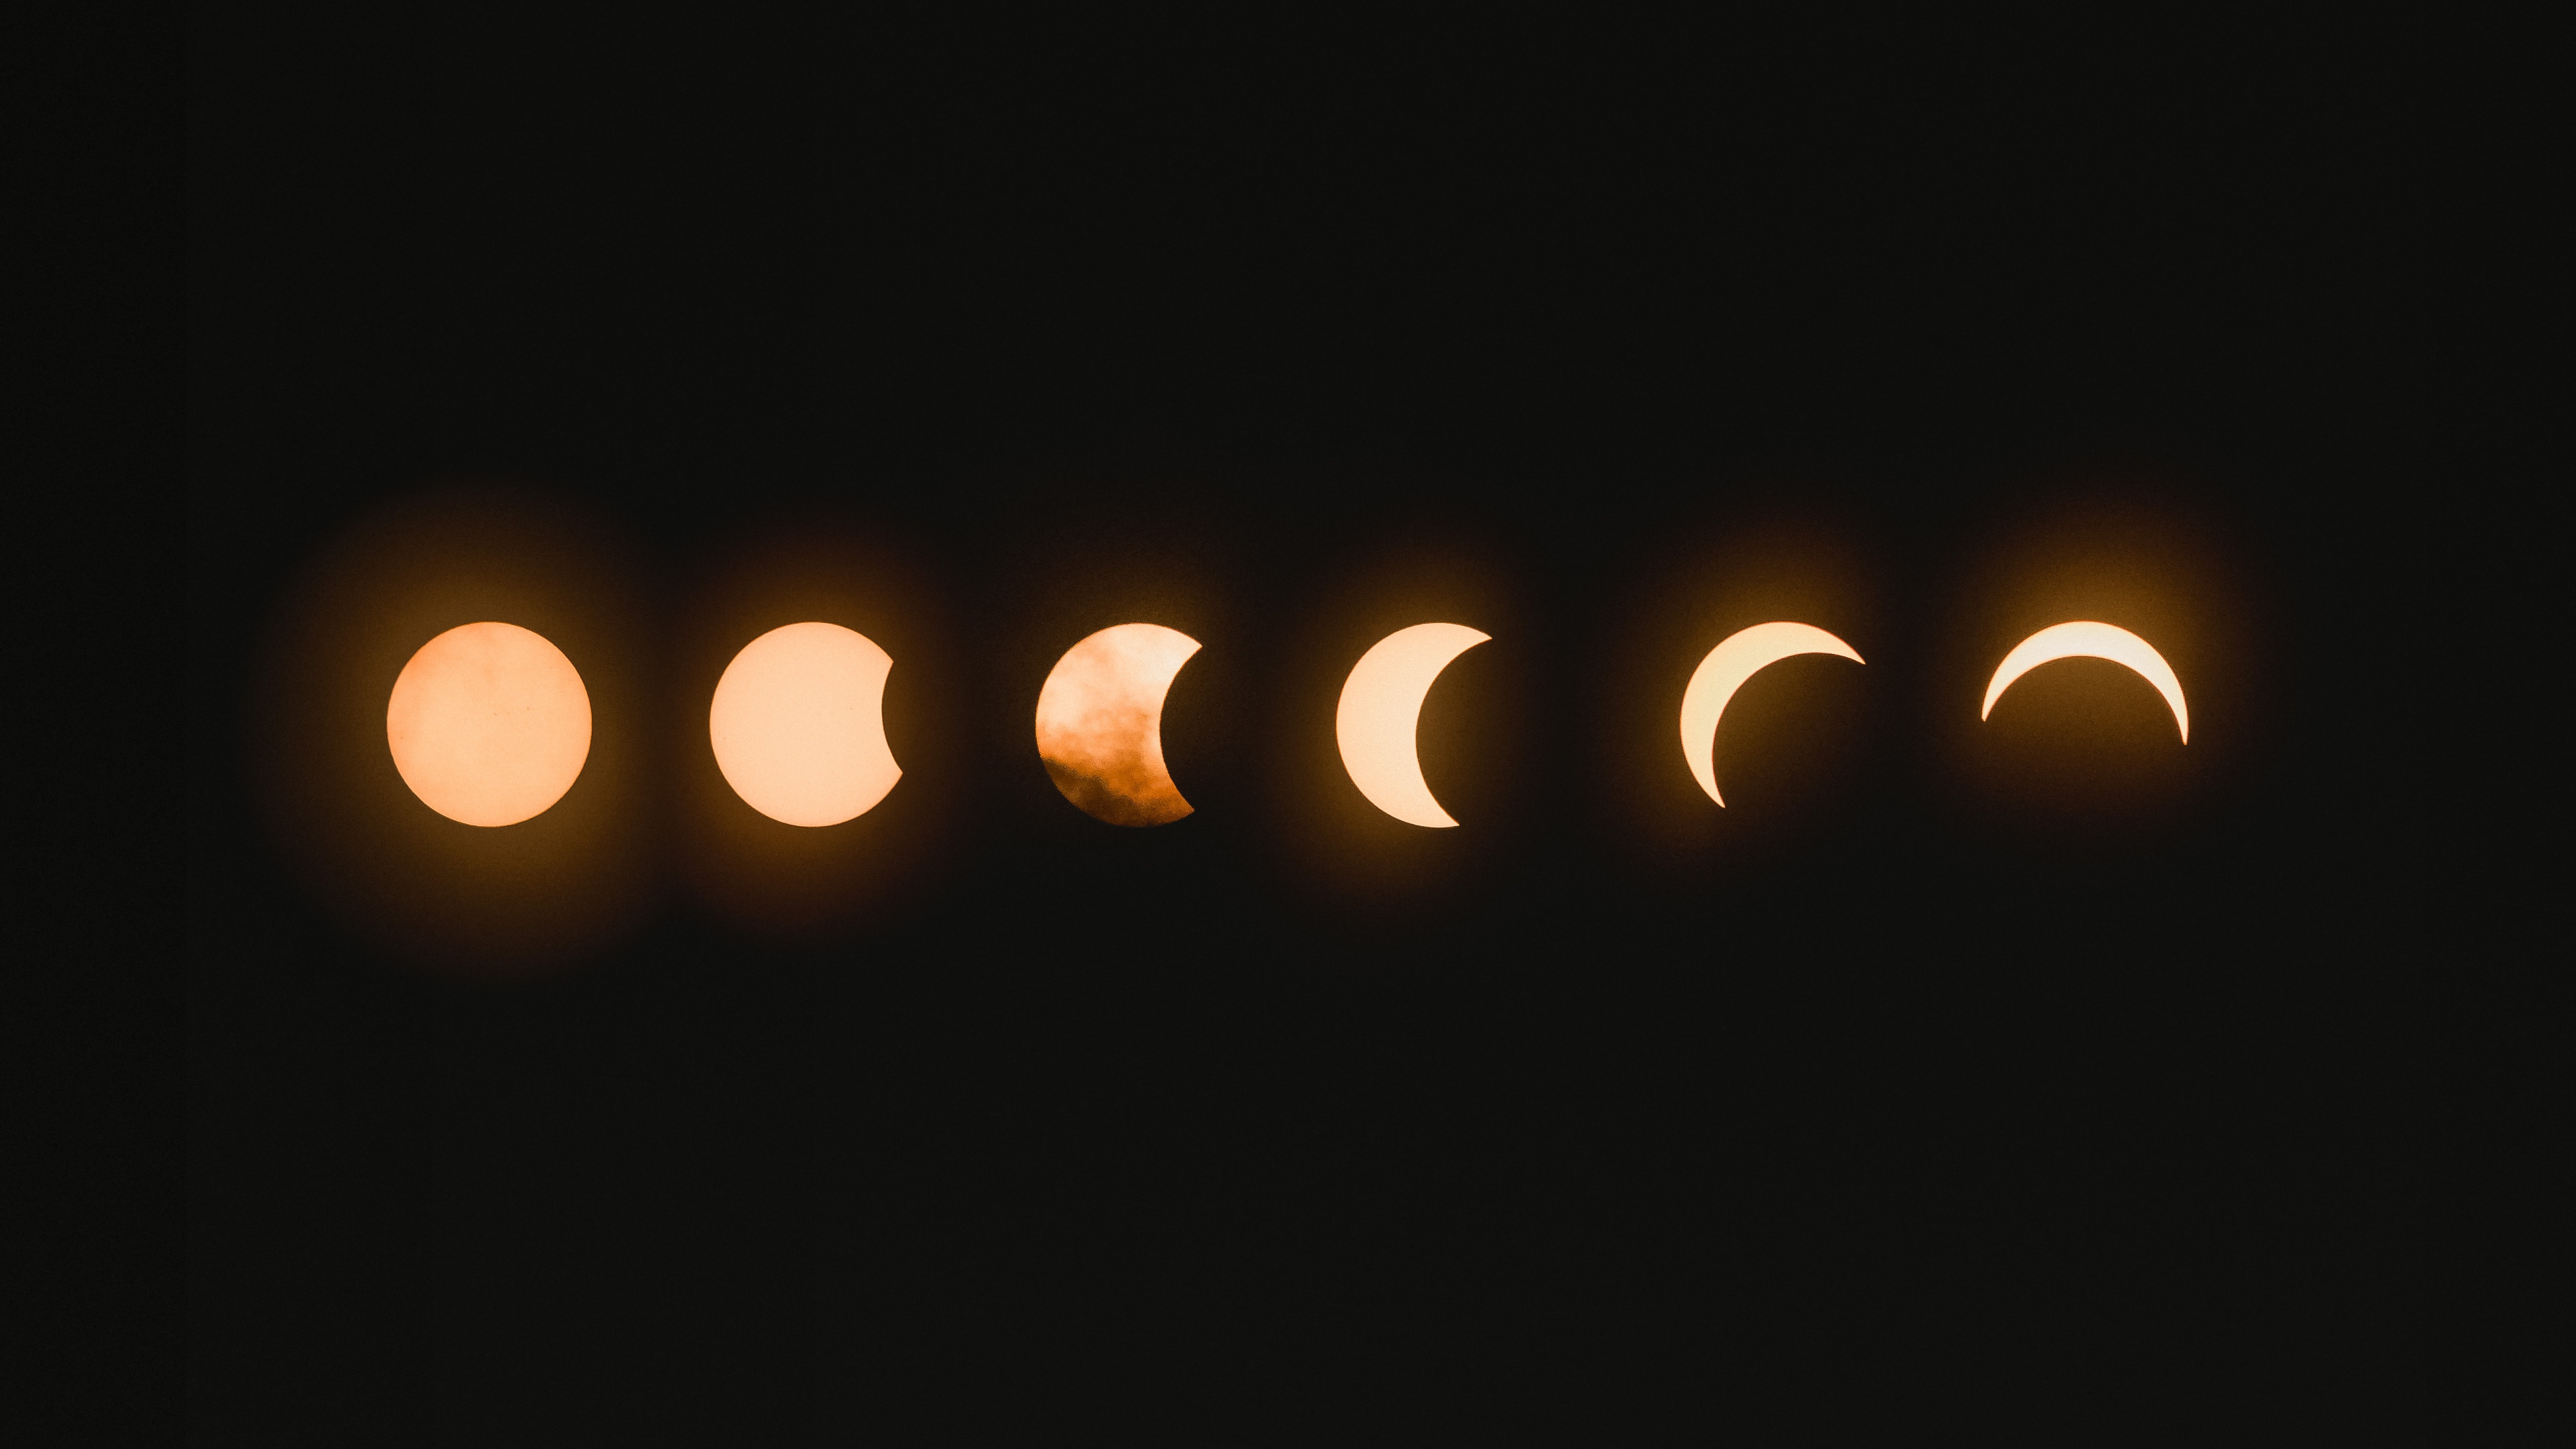 AI Enhances View of Moon